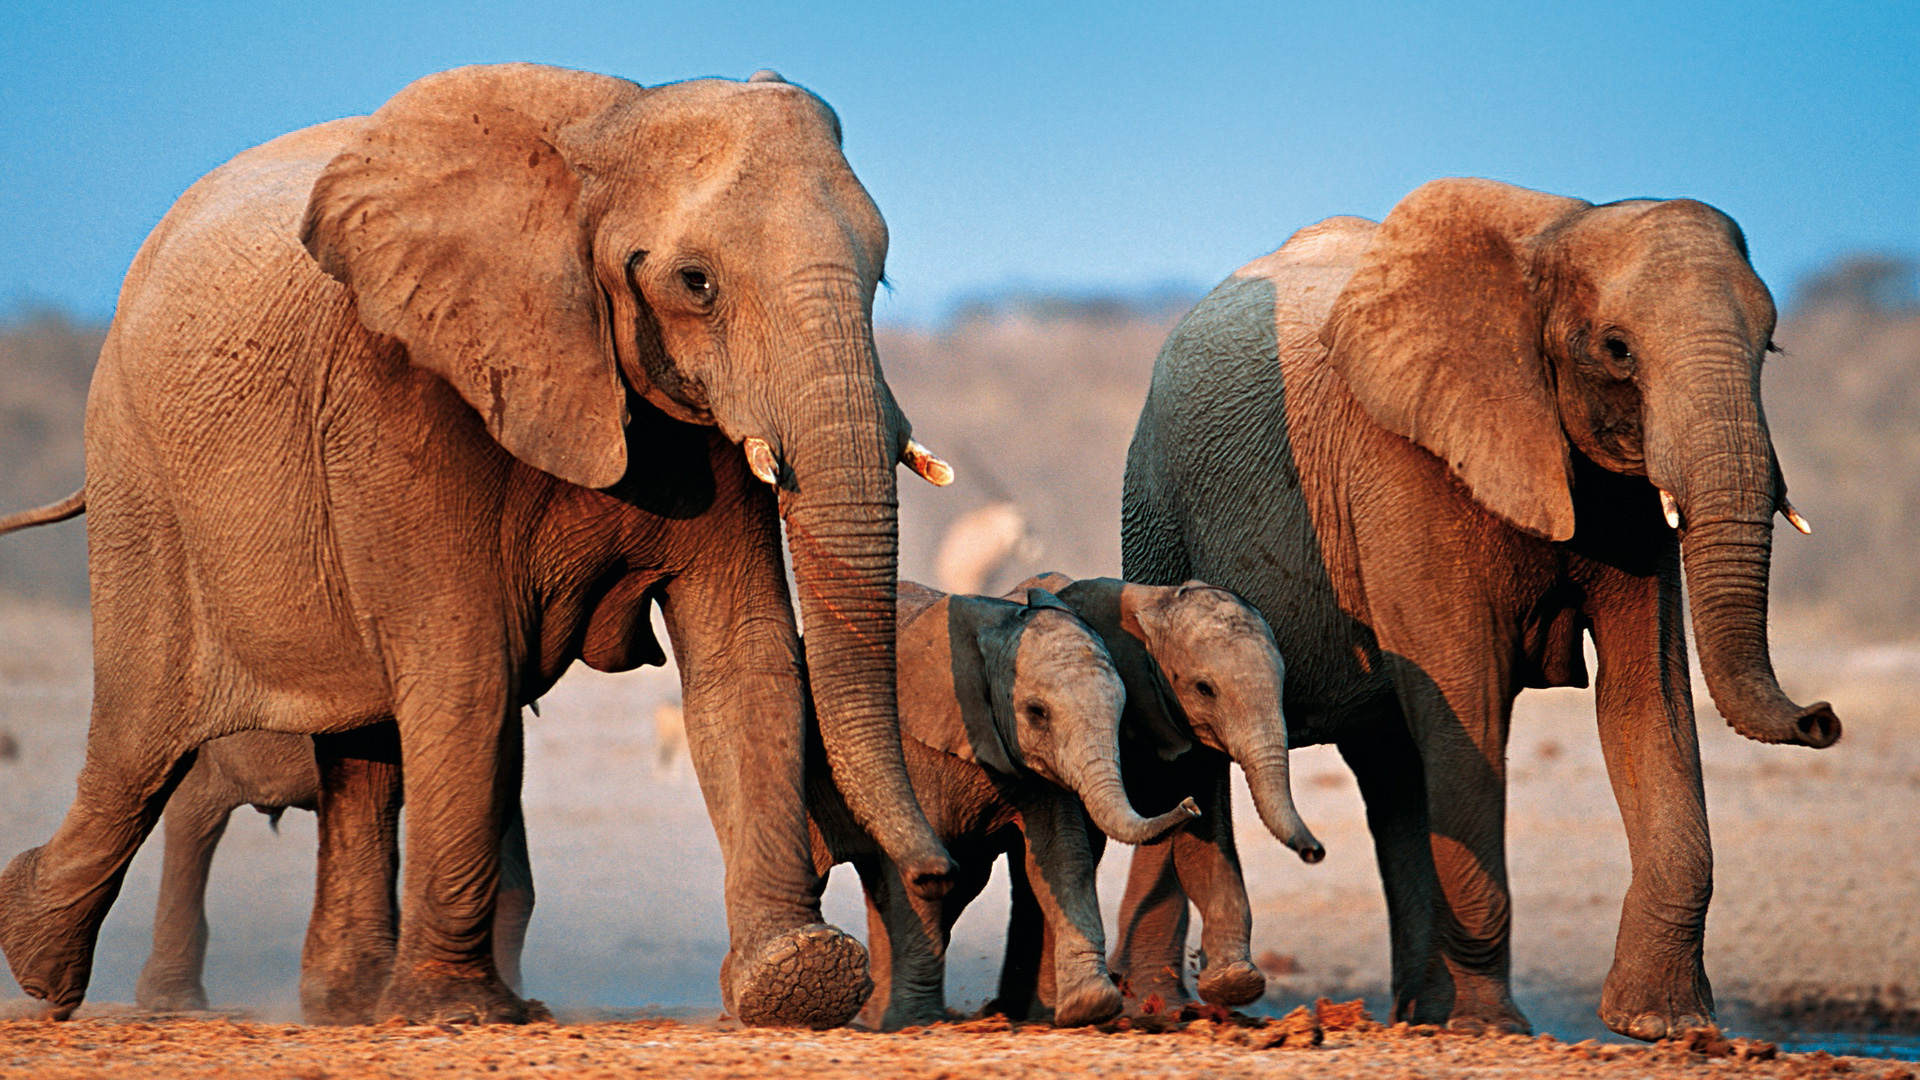 два слоненка картинка поняла про счастье